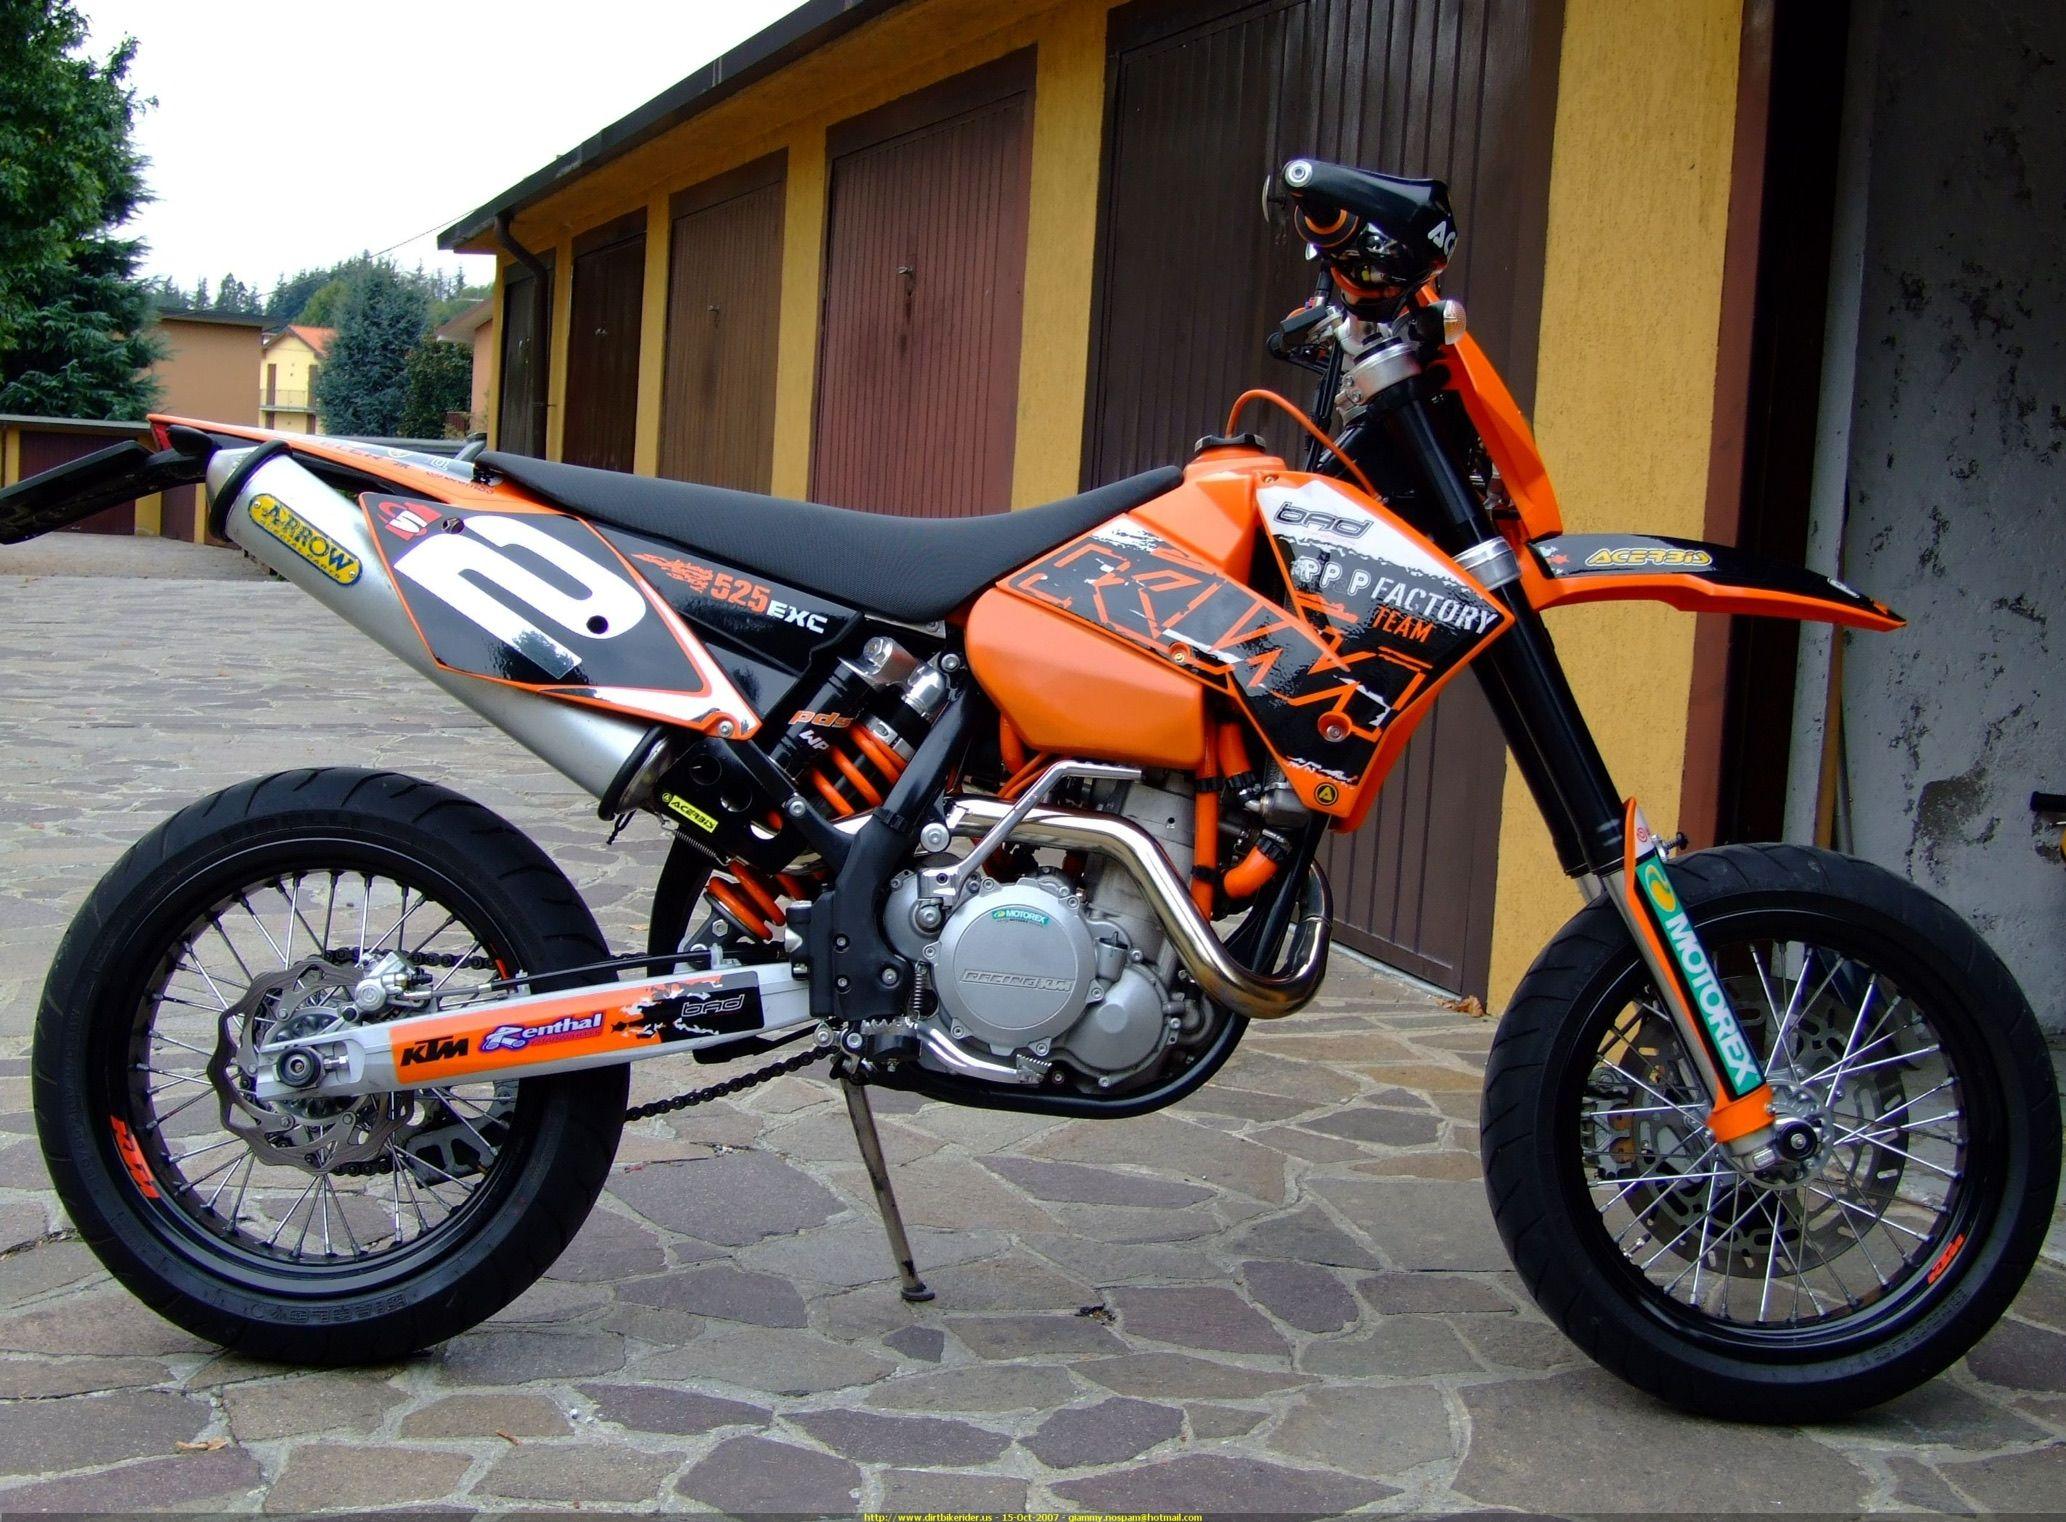 525 exc supermoto motorcycling ducati hypermotard ktm. Black Bedroom Furniture Sets. Home Design Ideas